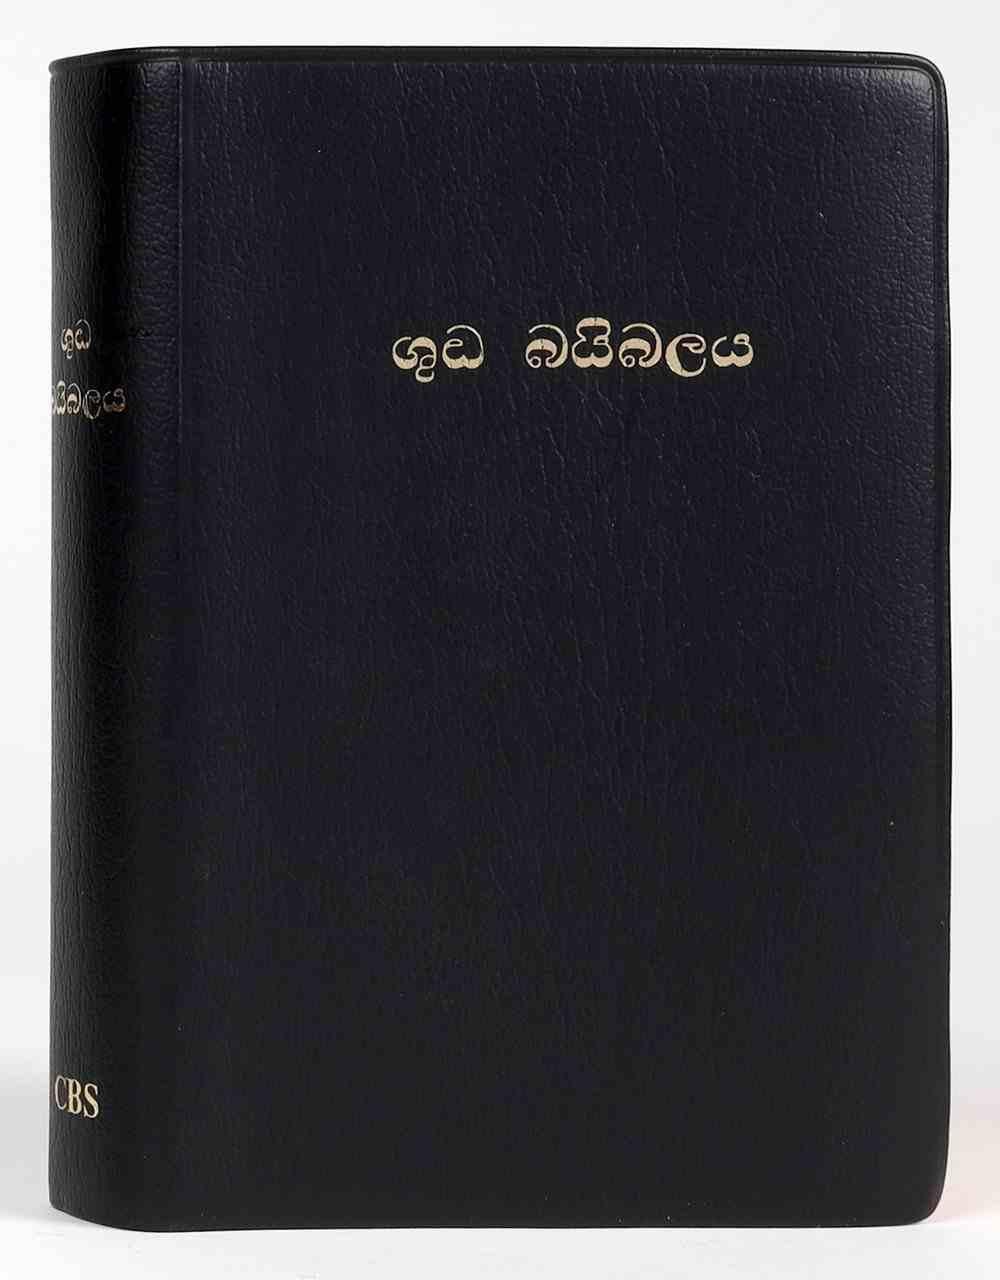 Sinhala Bible Traditional Translation (Sri Lanka) Imitation Leather